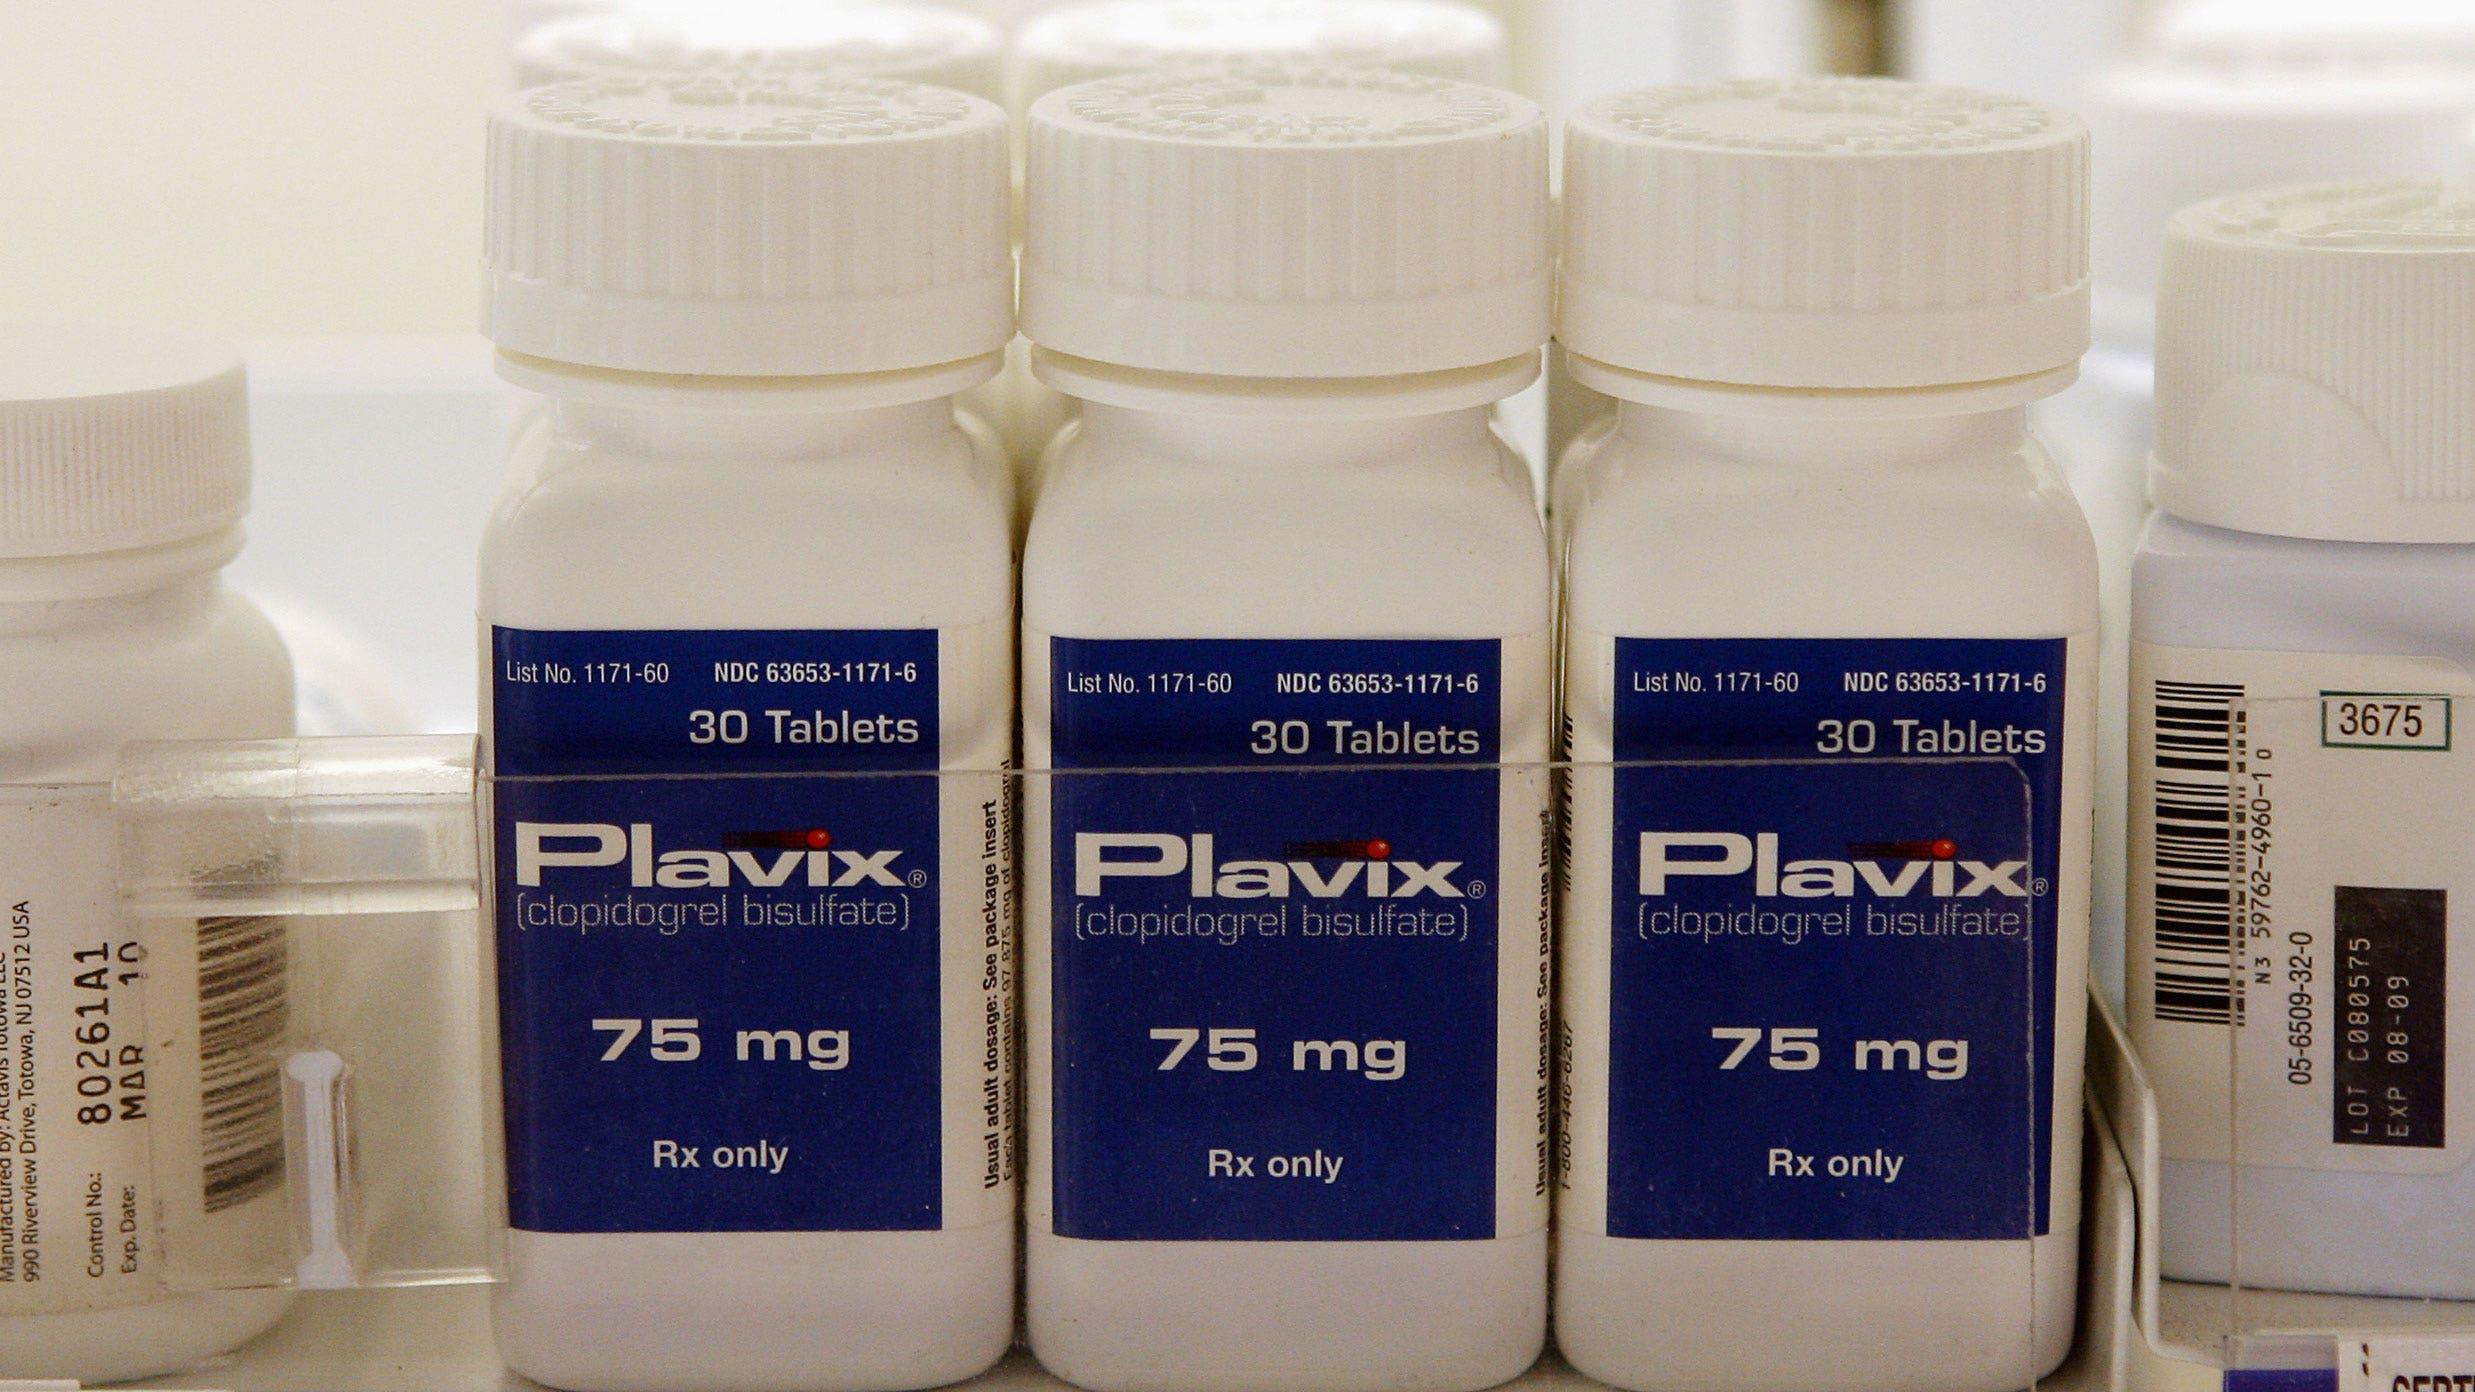 Bristol-Myers, Sanofi ordered to pay Hawaii $834 million over Plavix warning label - Fox Business